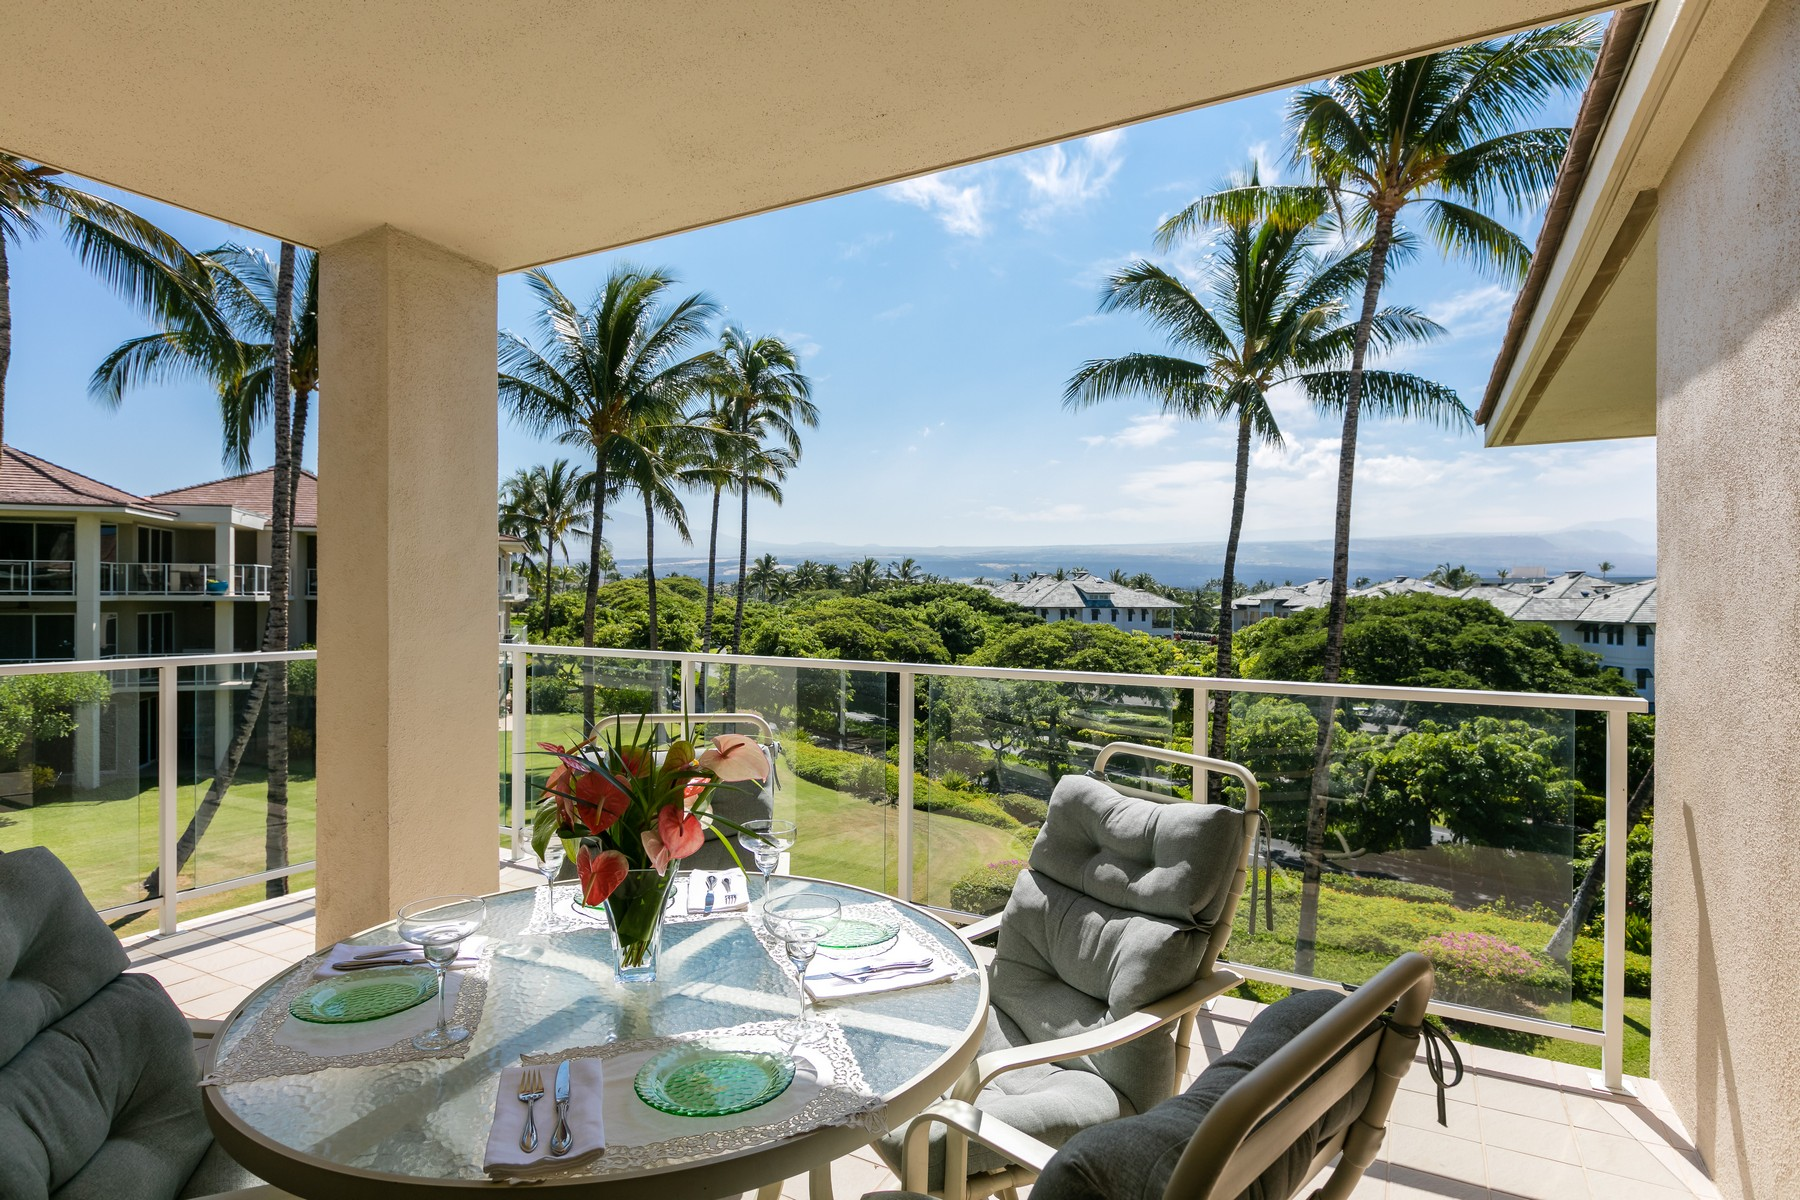 Residência urbana para Venda às Vista Waikoloa 69-1010 Keana Pl D303 Waikoloa, Havaí, 96738 Estados Unidos